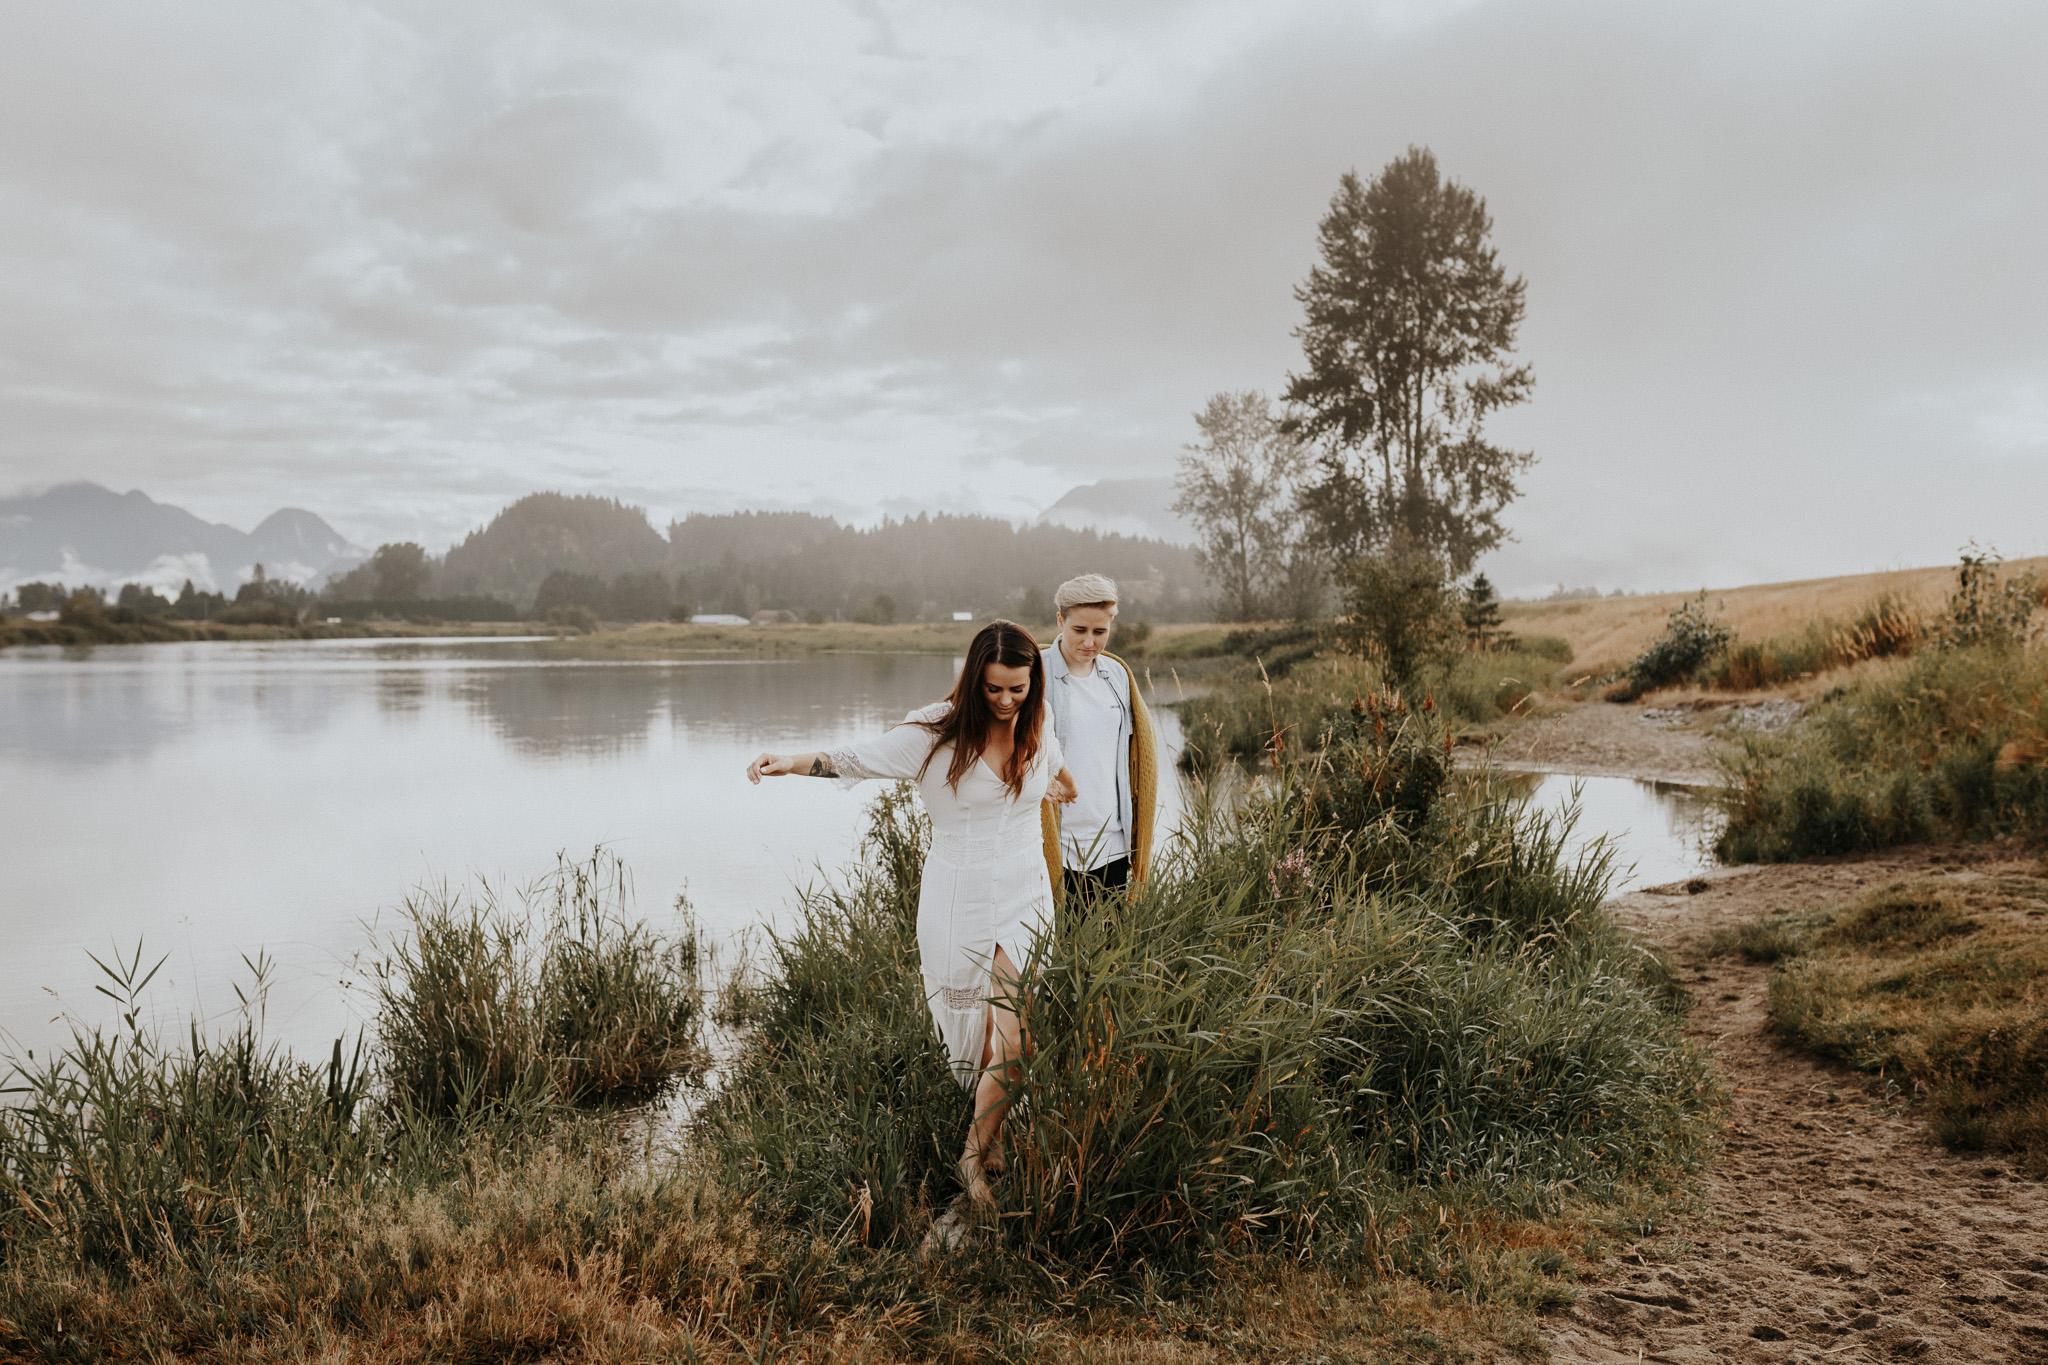 vancouver wedding photographer - lifestyle engagement session-18.jpg